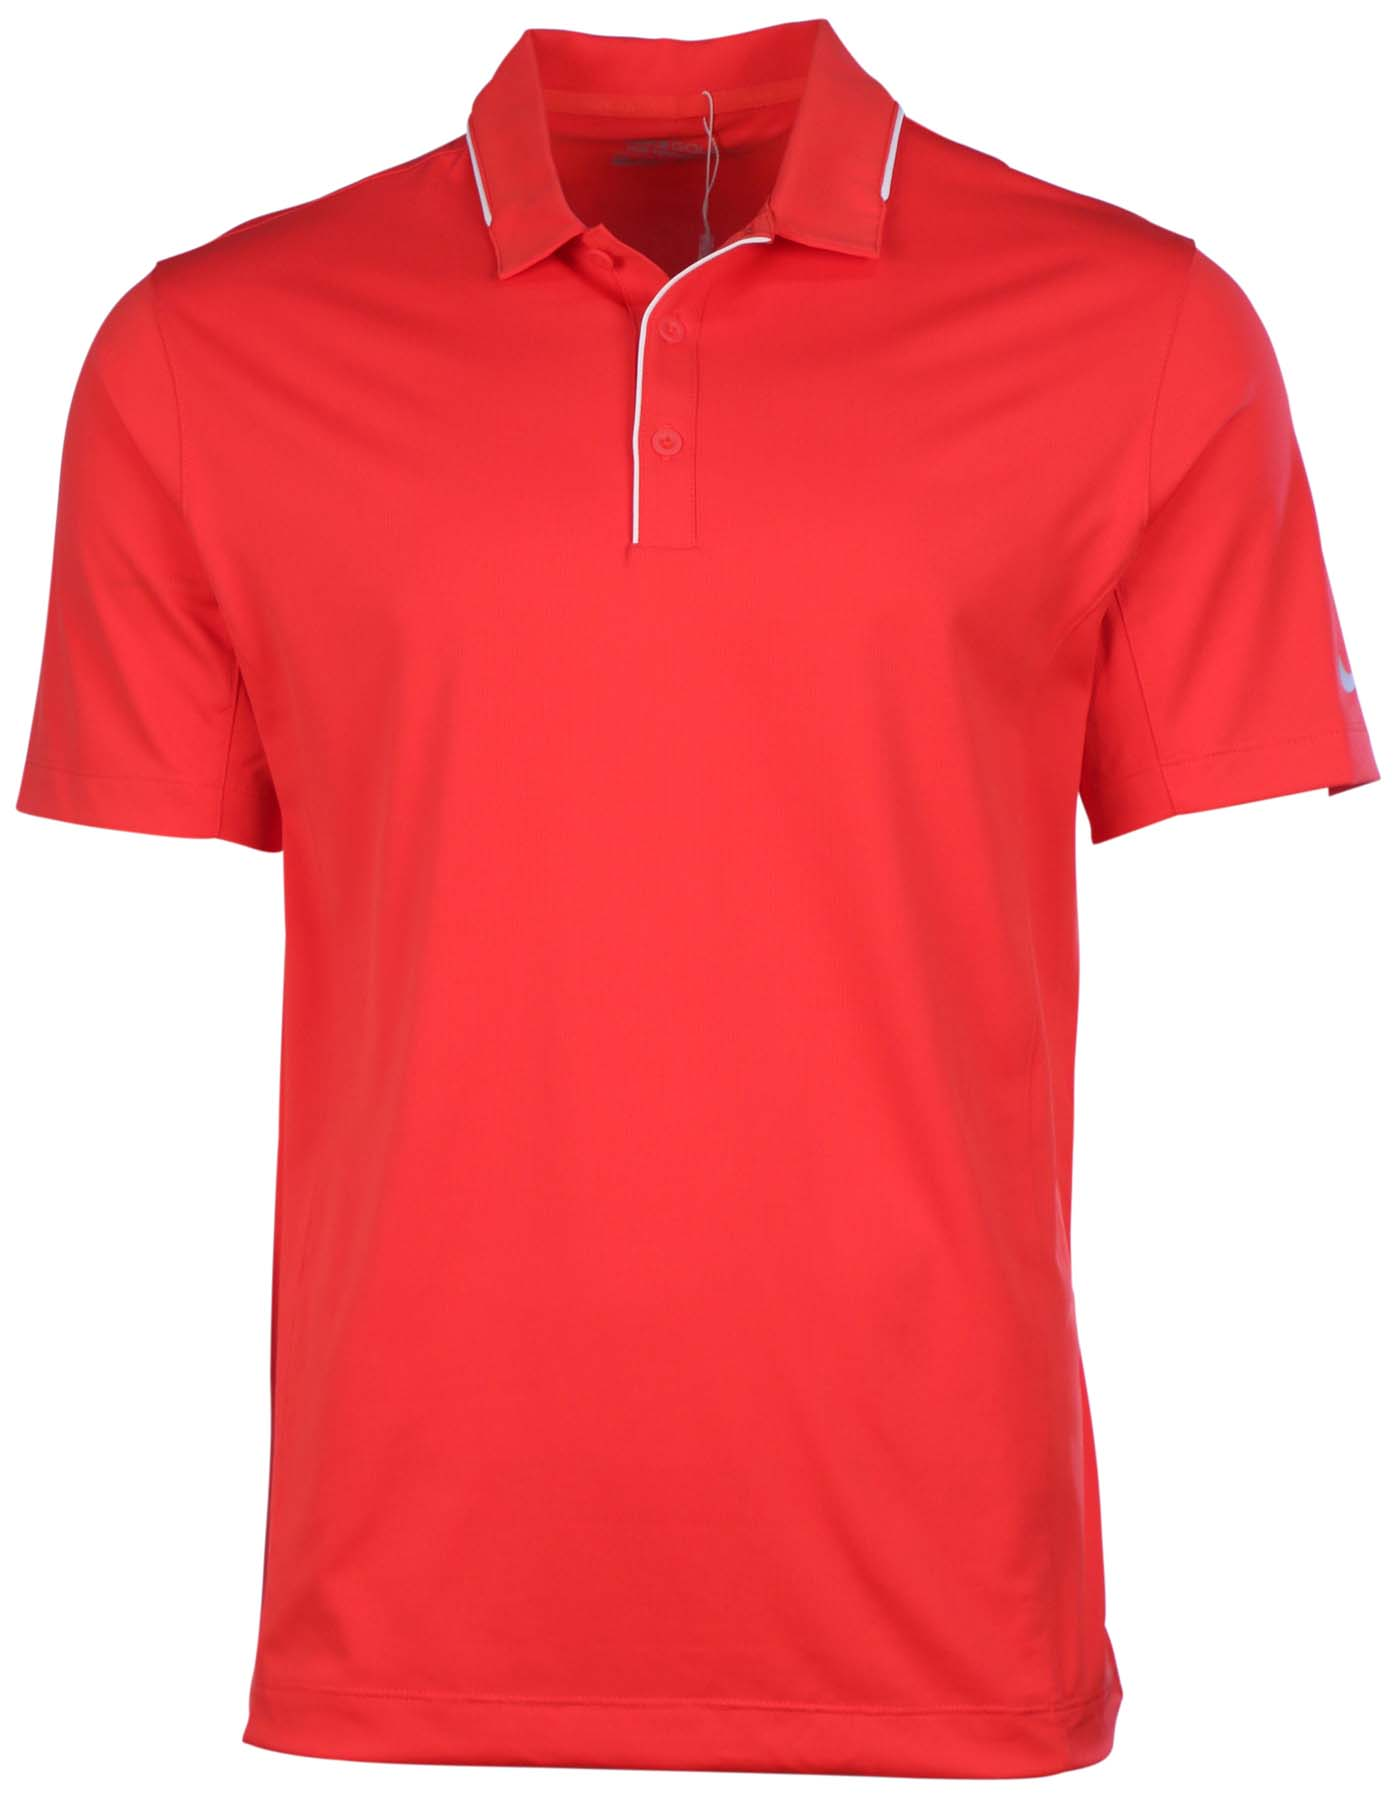 Nike Men 39 S Dri Fit Tech Tipped Golf Polo Shirt Ebay